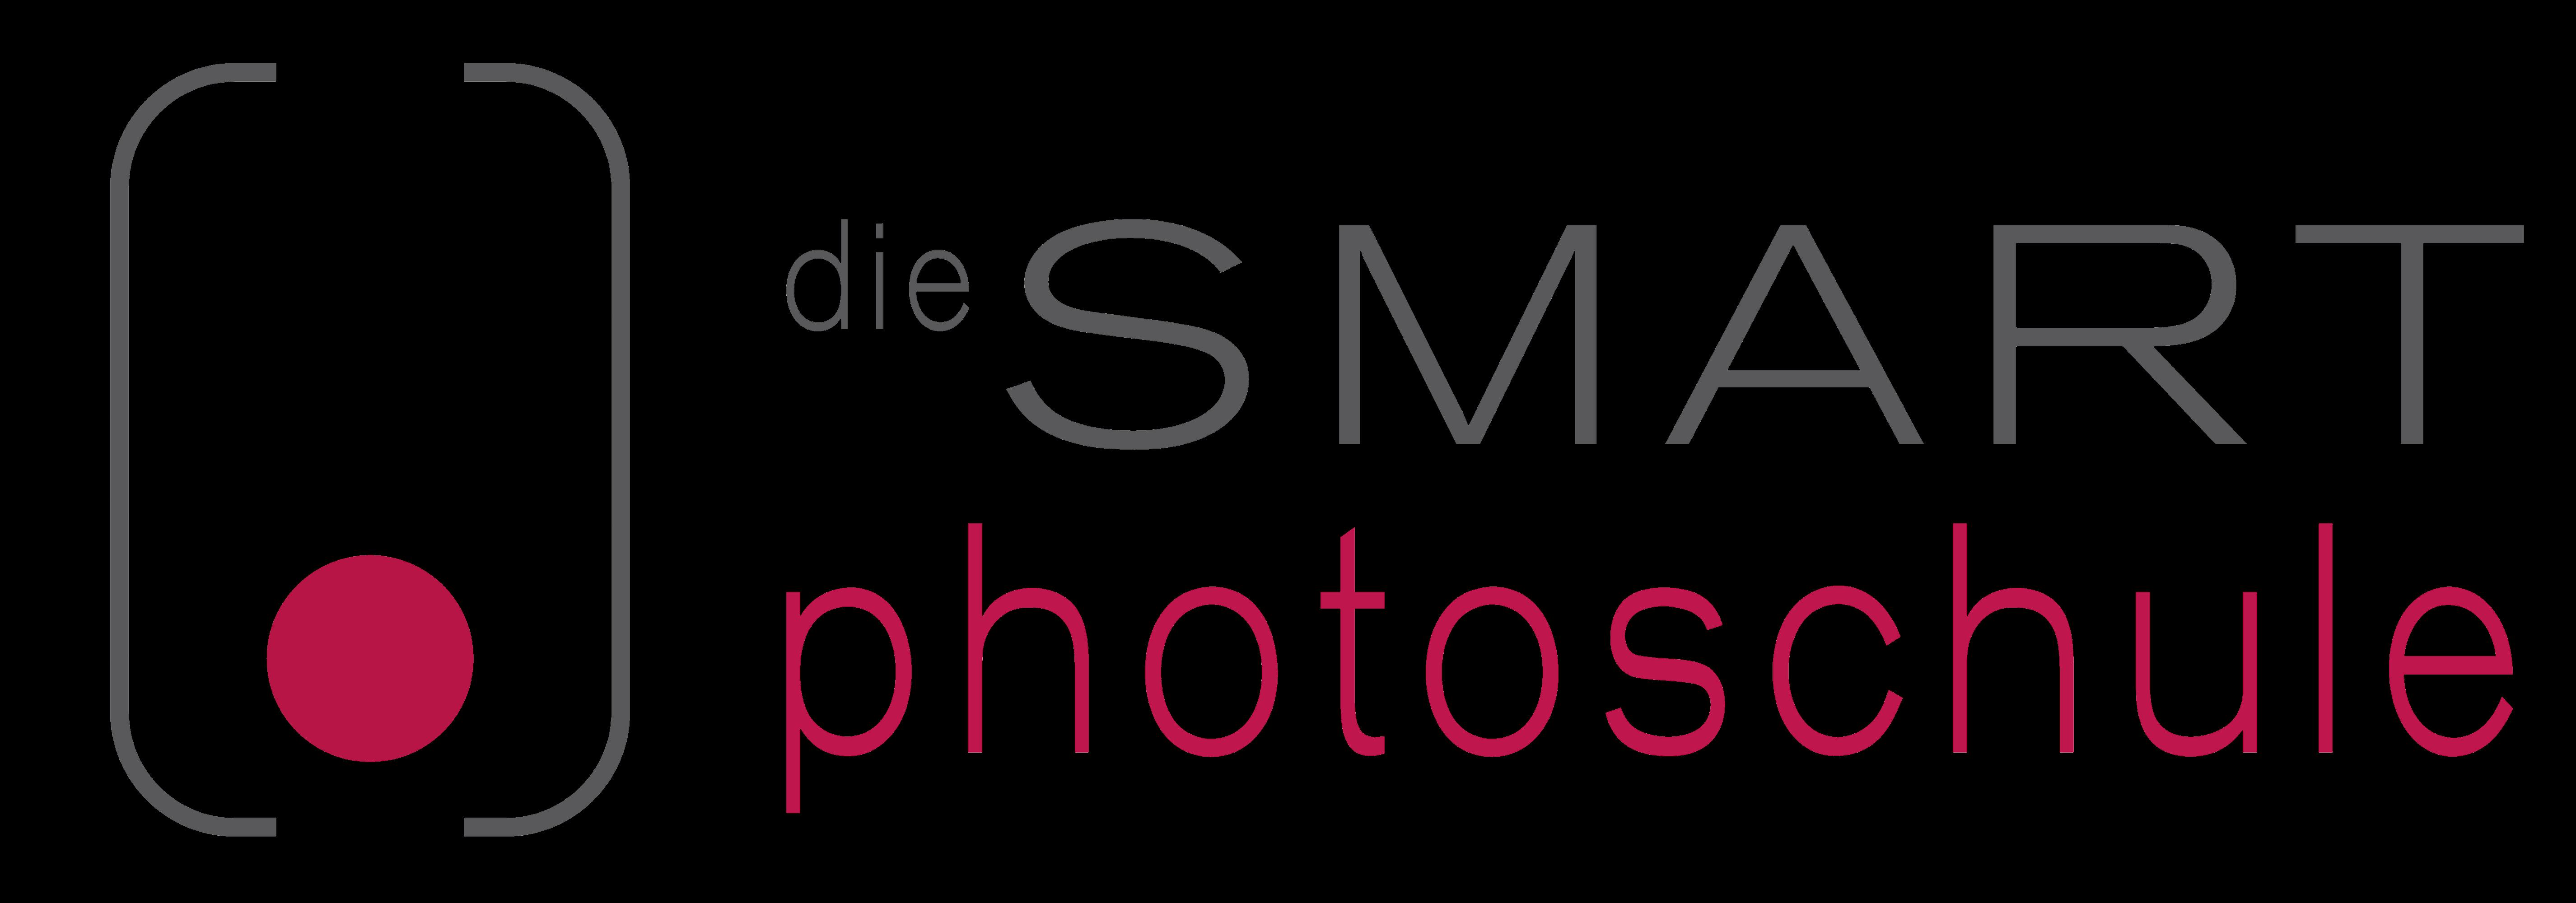 die-smartphotoschule